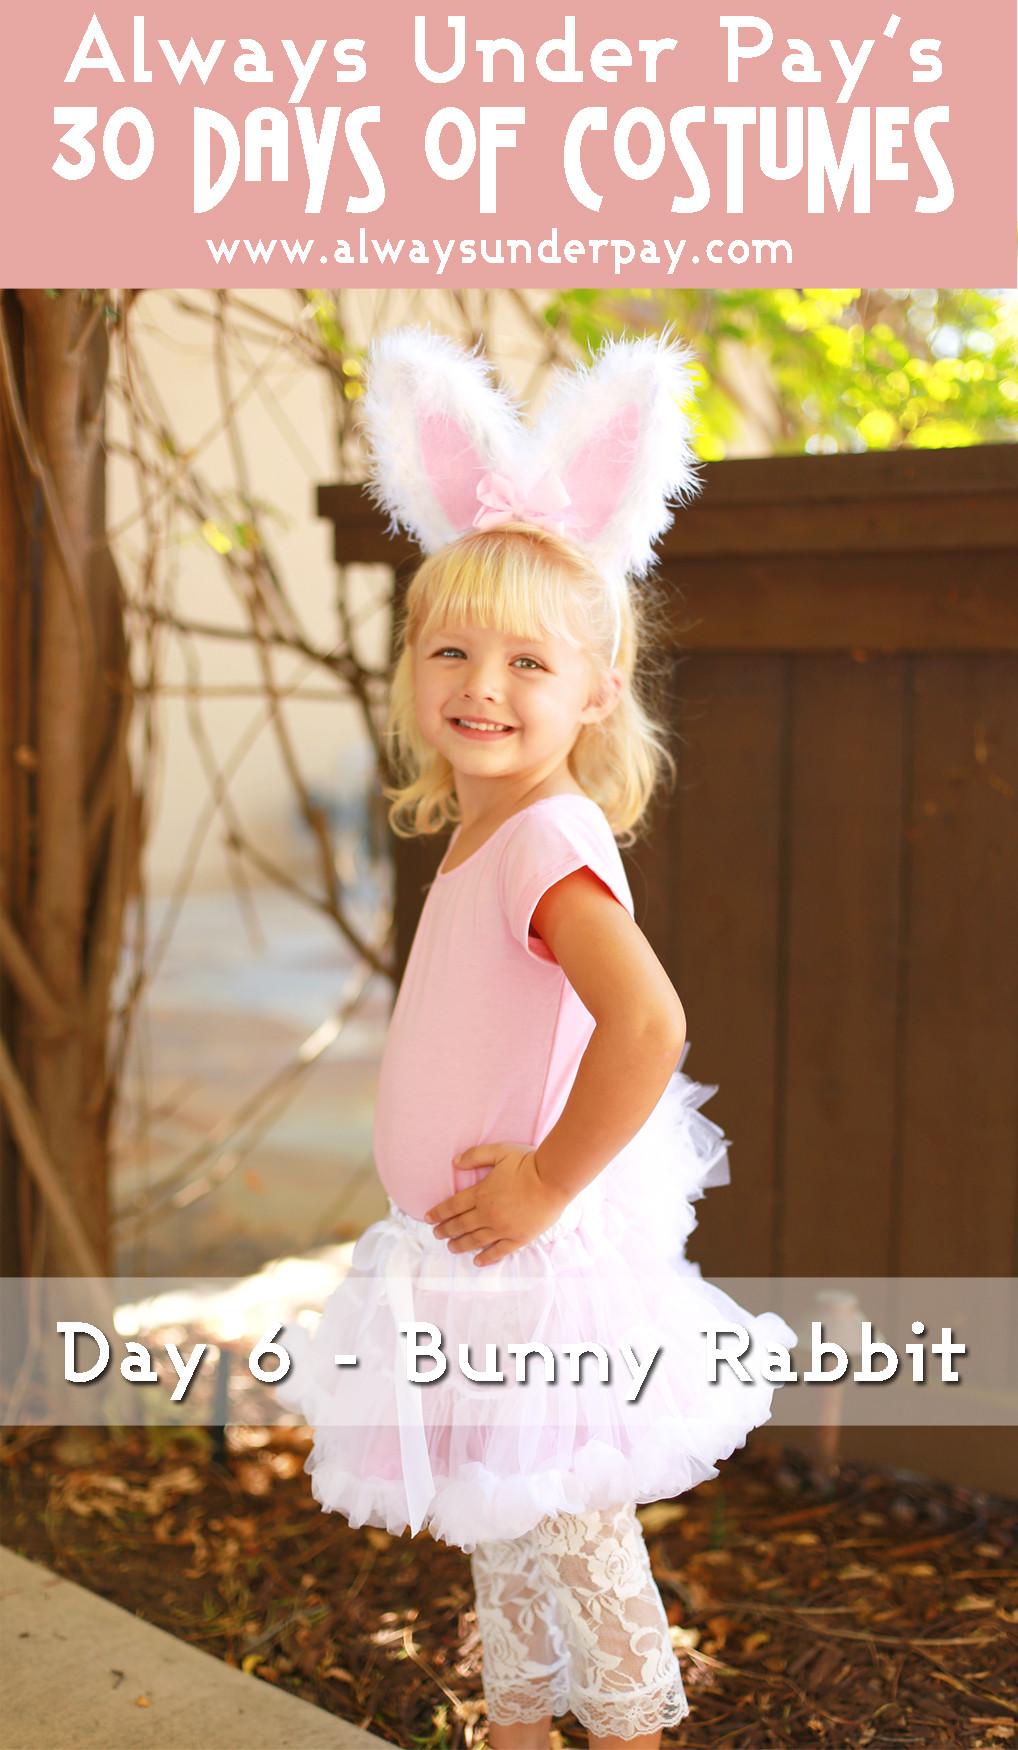 DIY Bunny Costume Toddler  Day 6 – Bunny Rabbit DIY Halloween Costume Tutorial Cheap